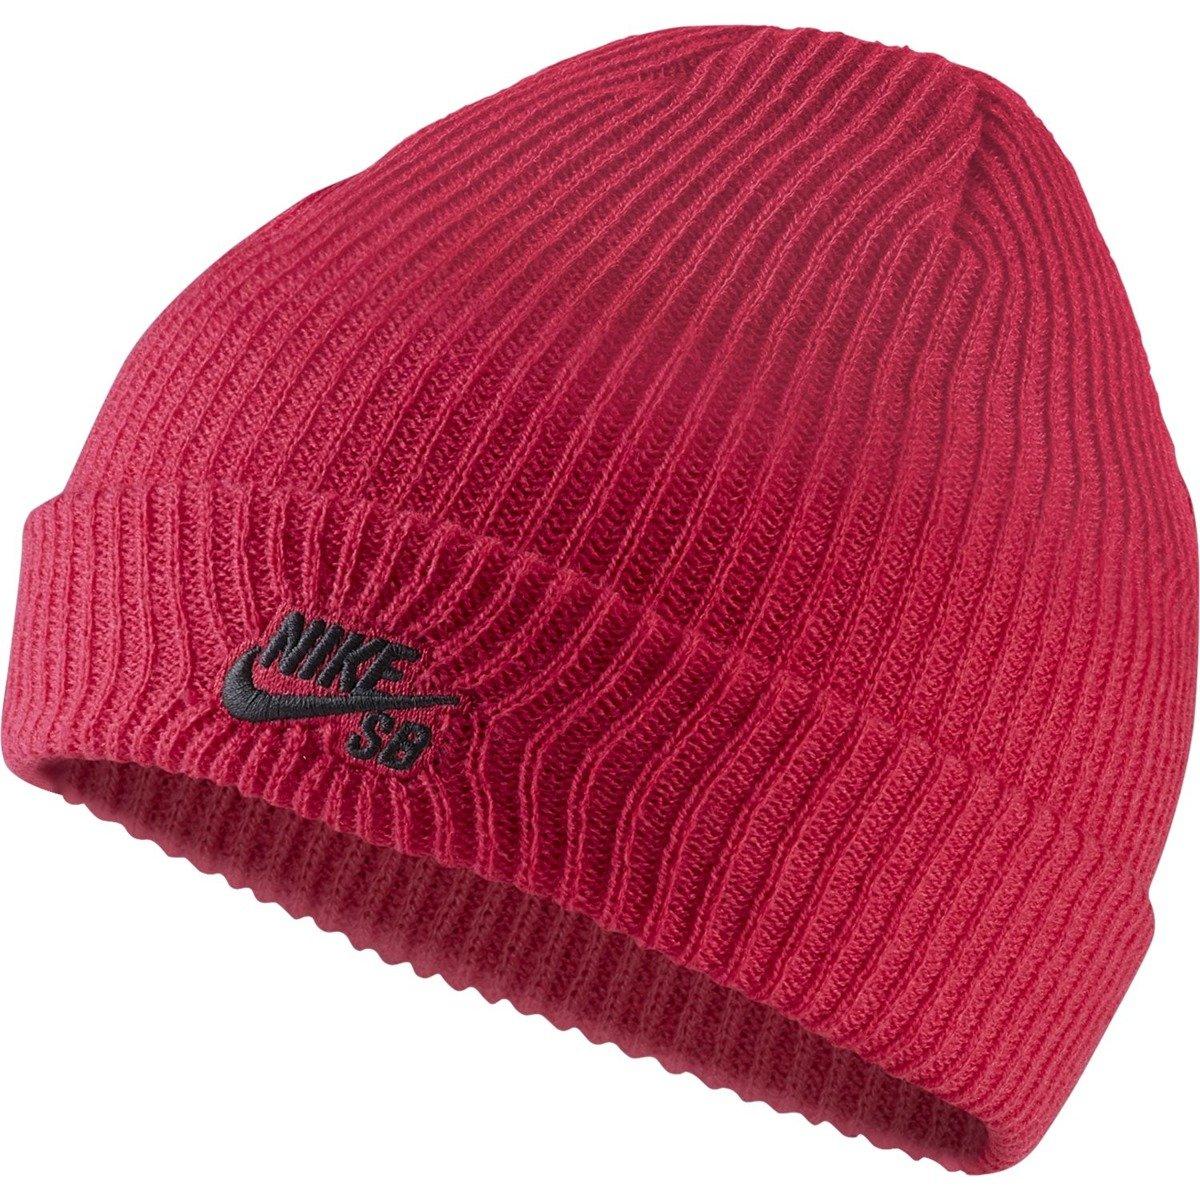 Leeds excursionismo hasta ahora  nike sb fisherman beanie Rush Pink/black czerwony | Clothes \ Cap \ Beanie  Brands \ Nike SB Produkt Na Prezent ALL | Skateshop Miniramp.pl